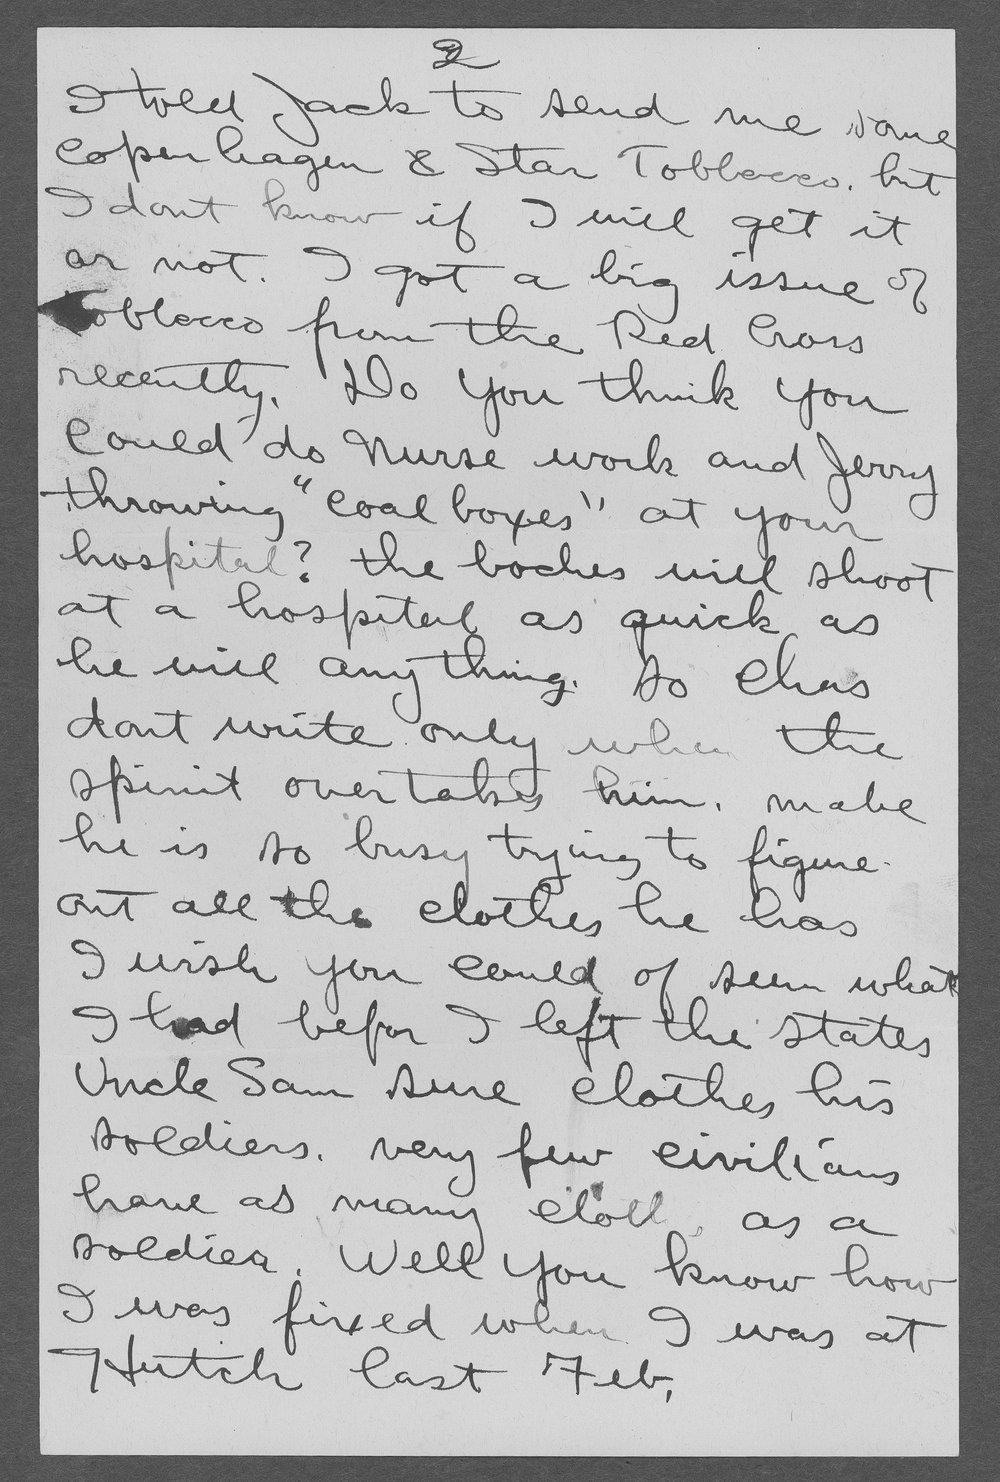 Heise Henry Sebree, World War I soldier - 11